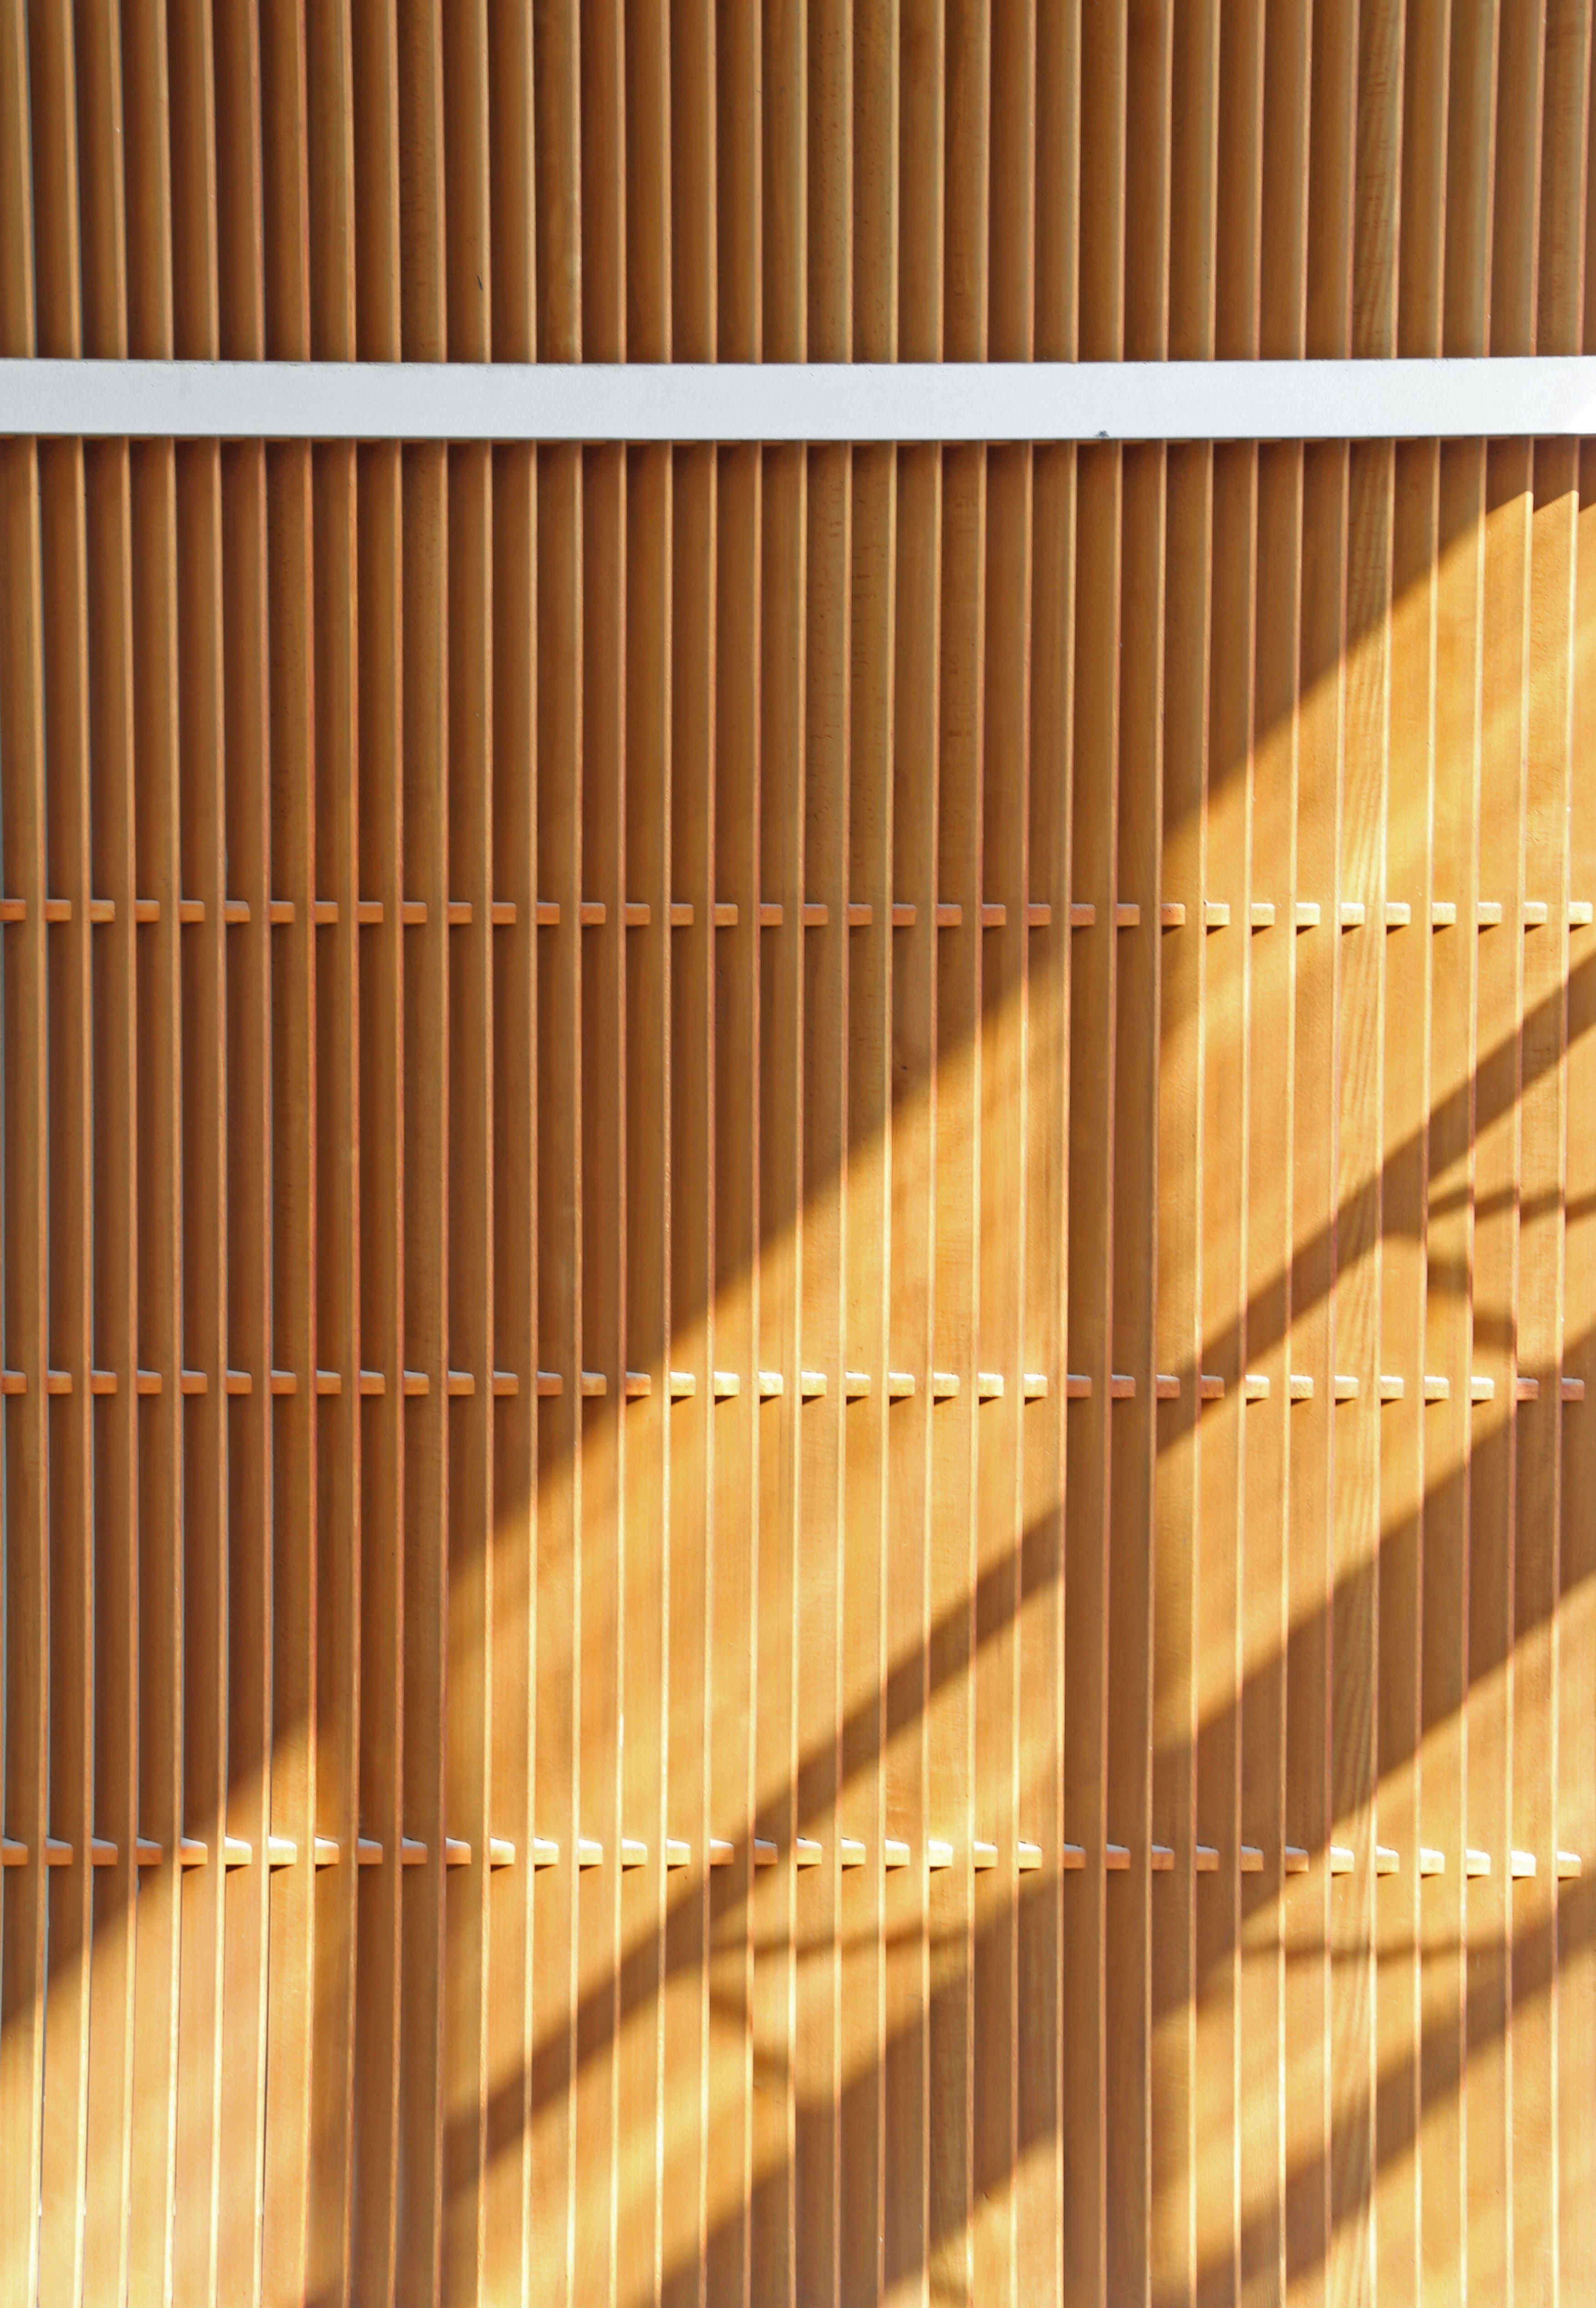 Arne Jacobsen and Erik Møller's Modernist City Hall in Aarhus, Denmark Photos | Architectural Digest